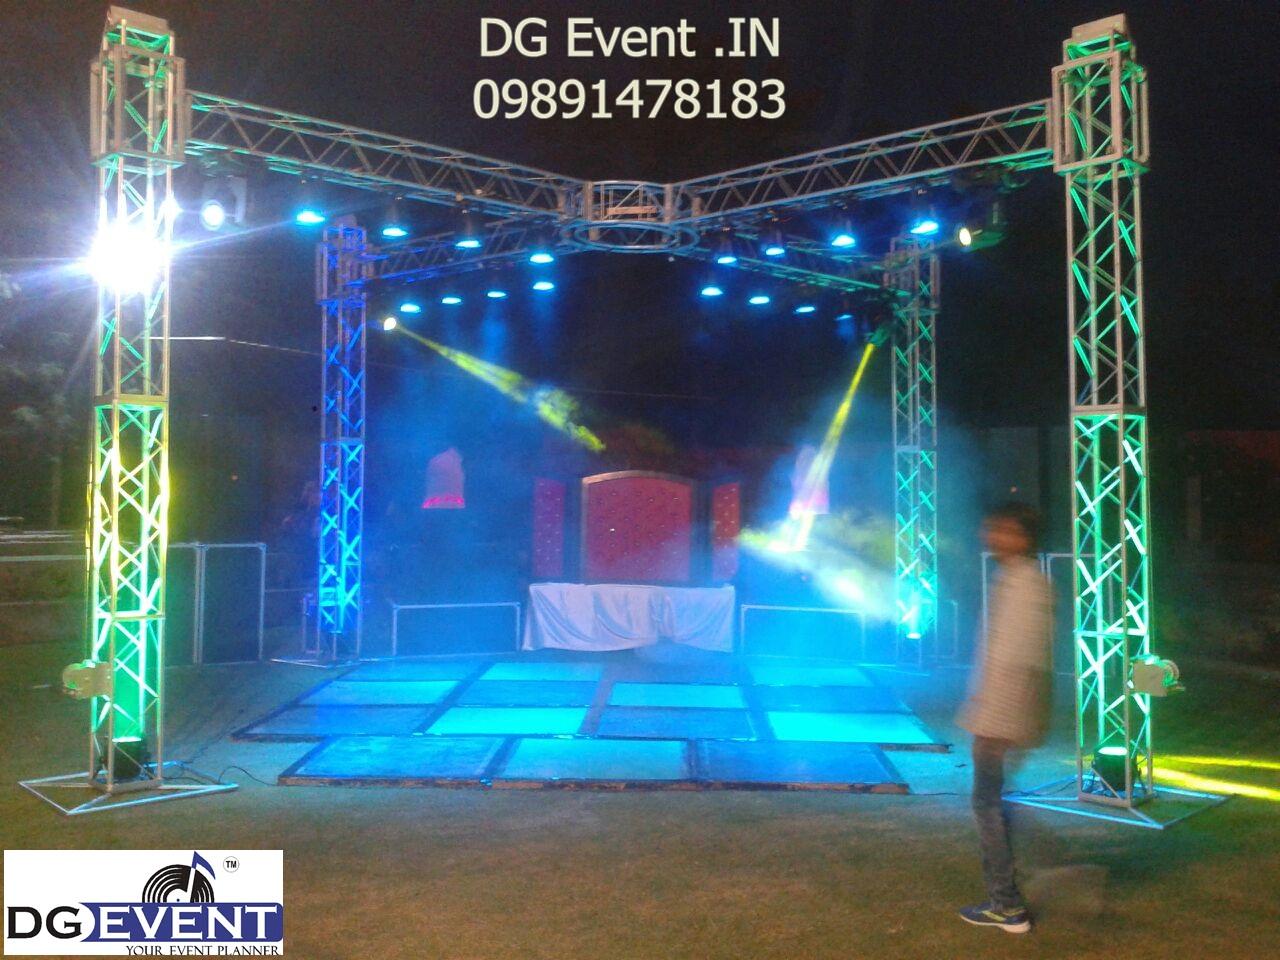 4 Side Truss Dj Sound Light Setup By DG Event In Dgeventin09891478183 09891478560